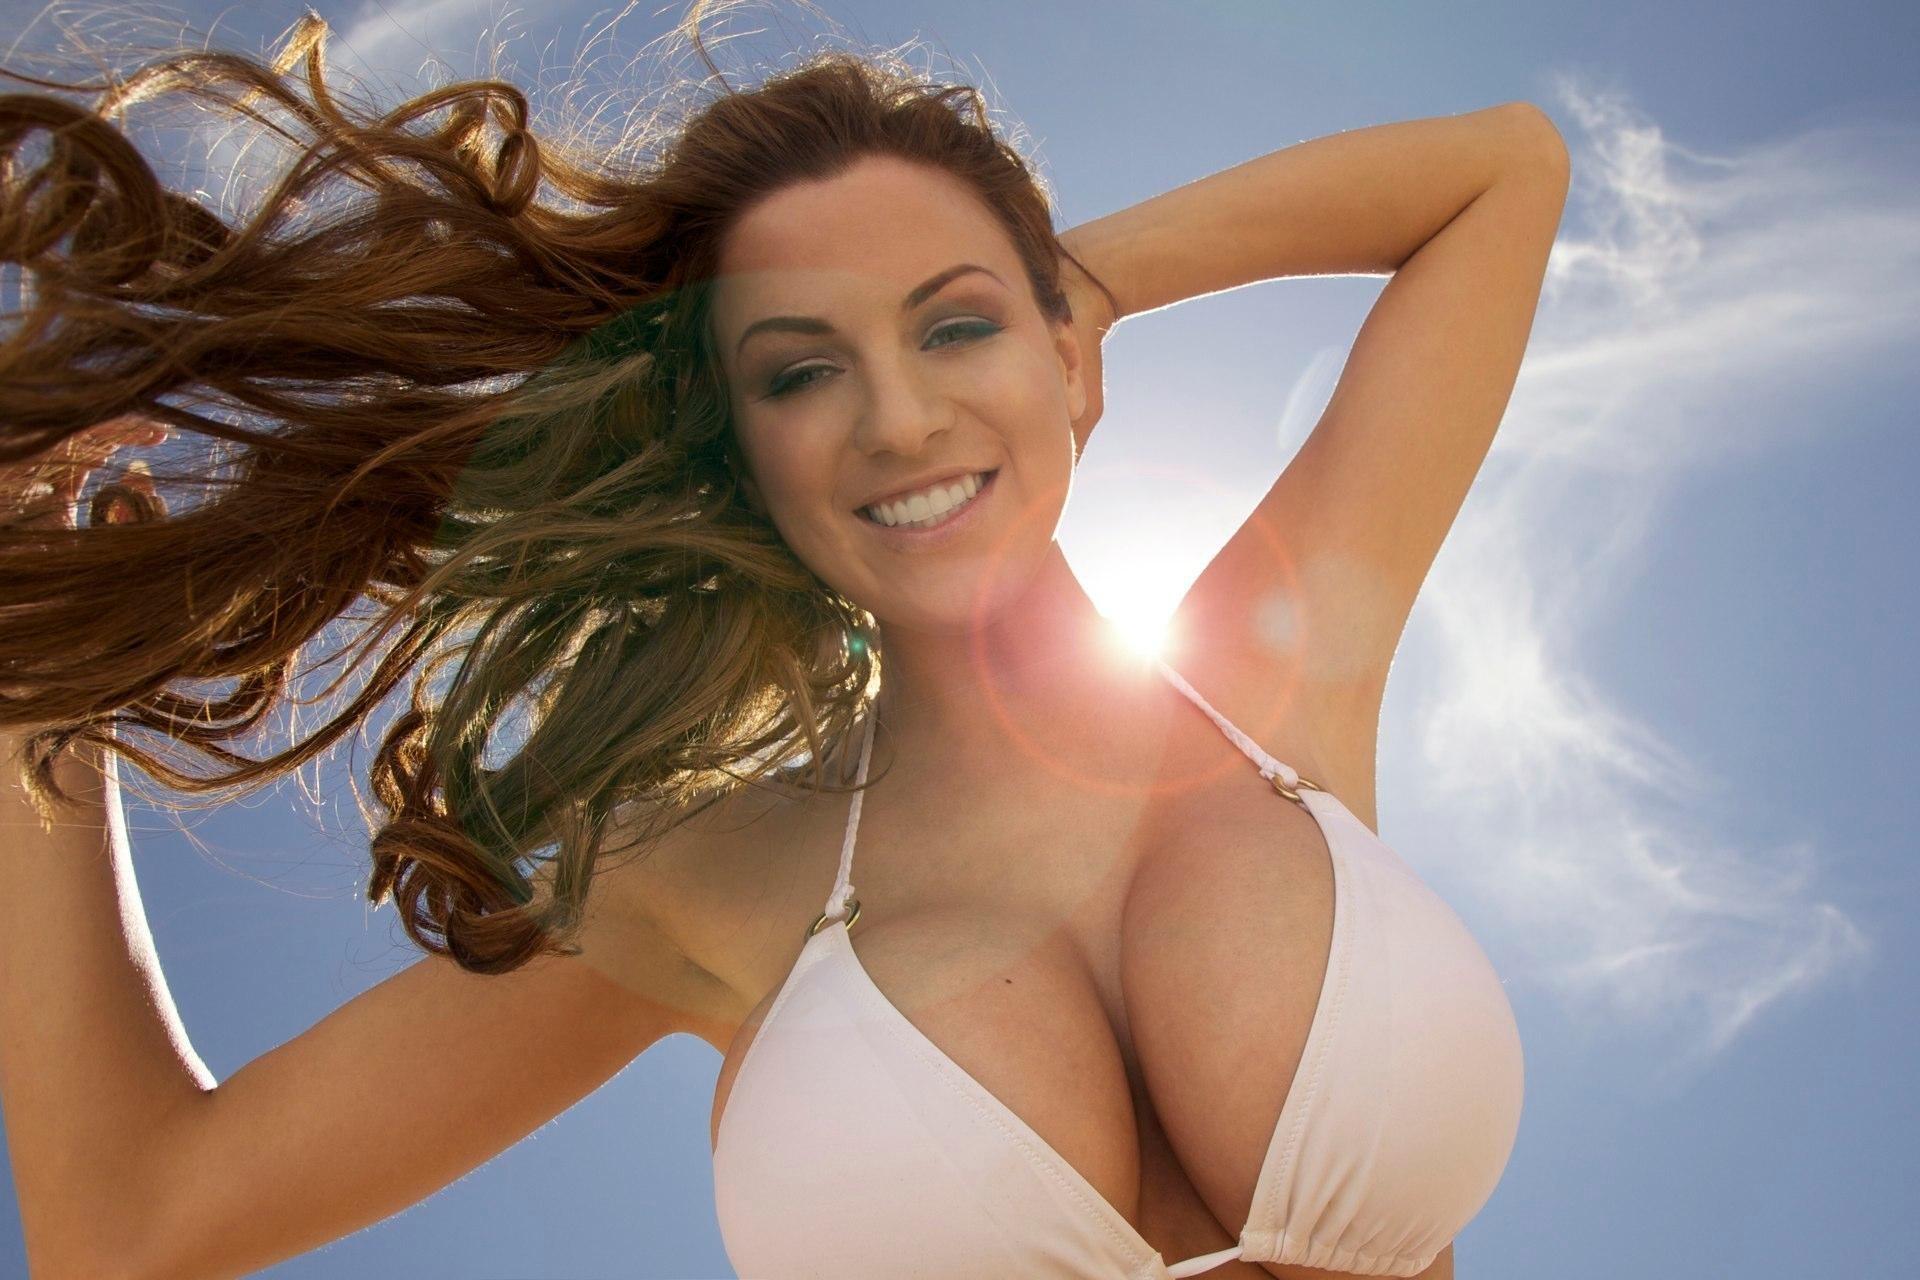 Huge Tits Model Jordan Carver